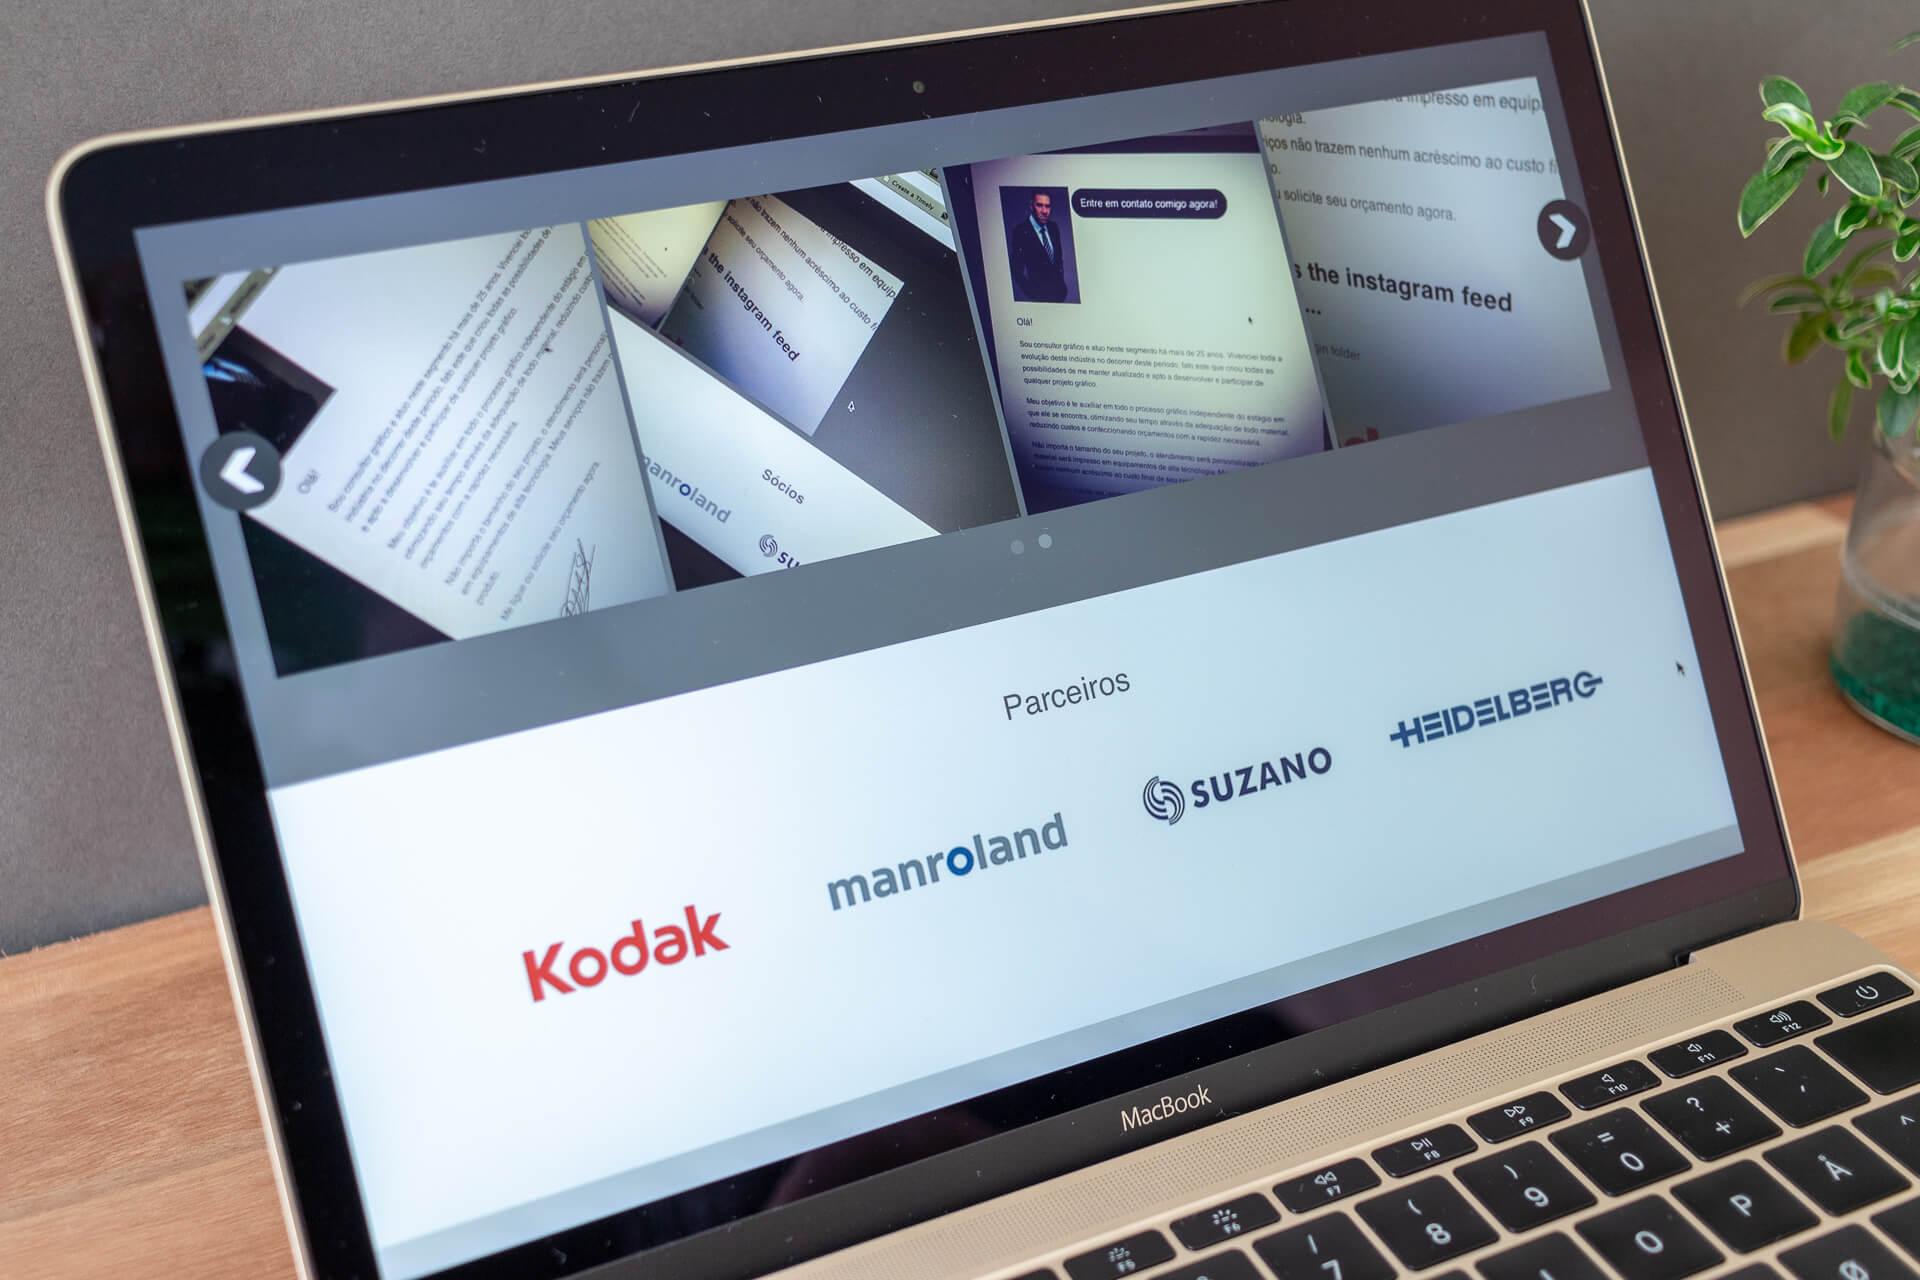 Instagram slideshow and partners logos.